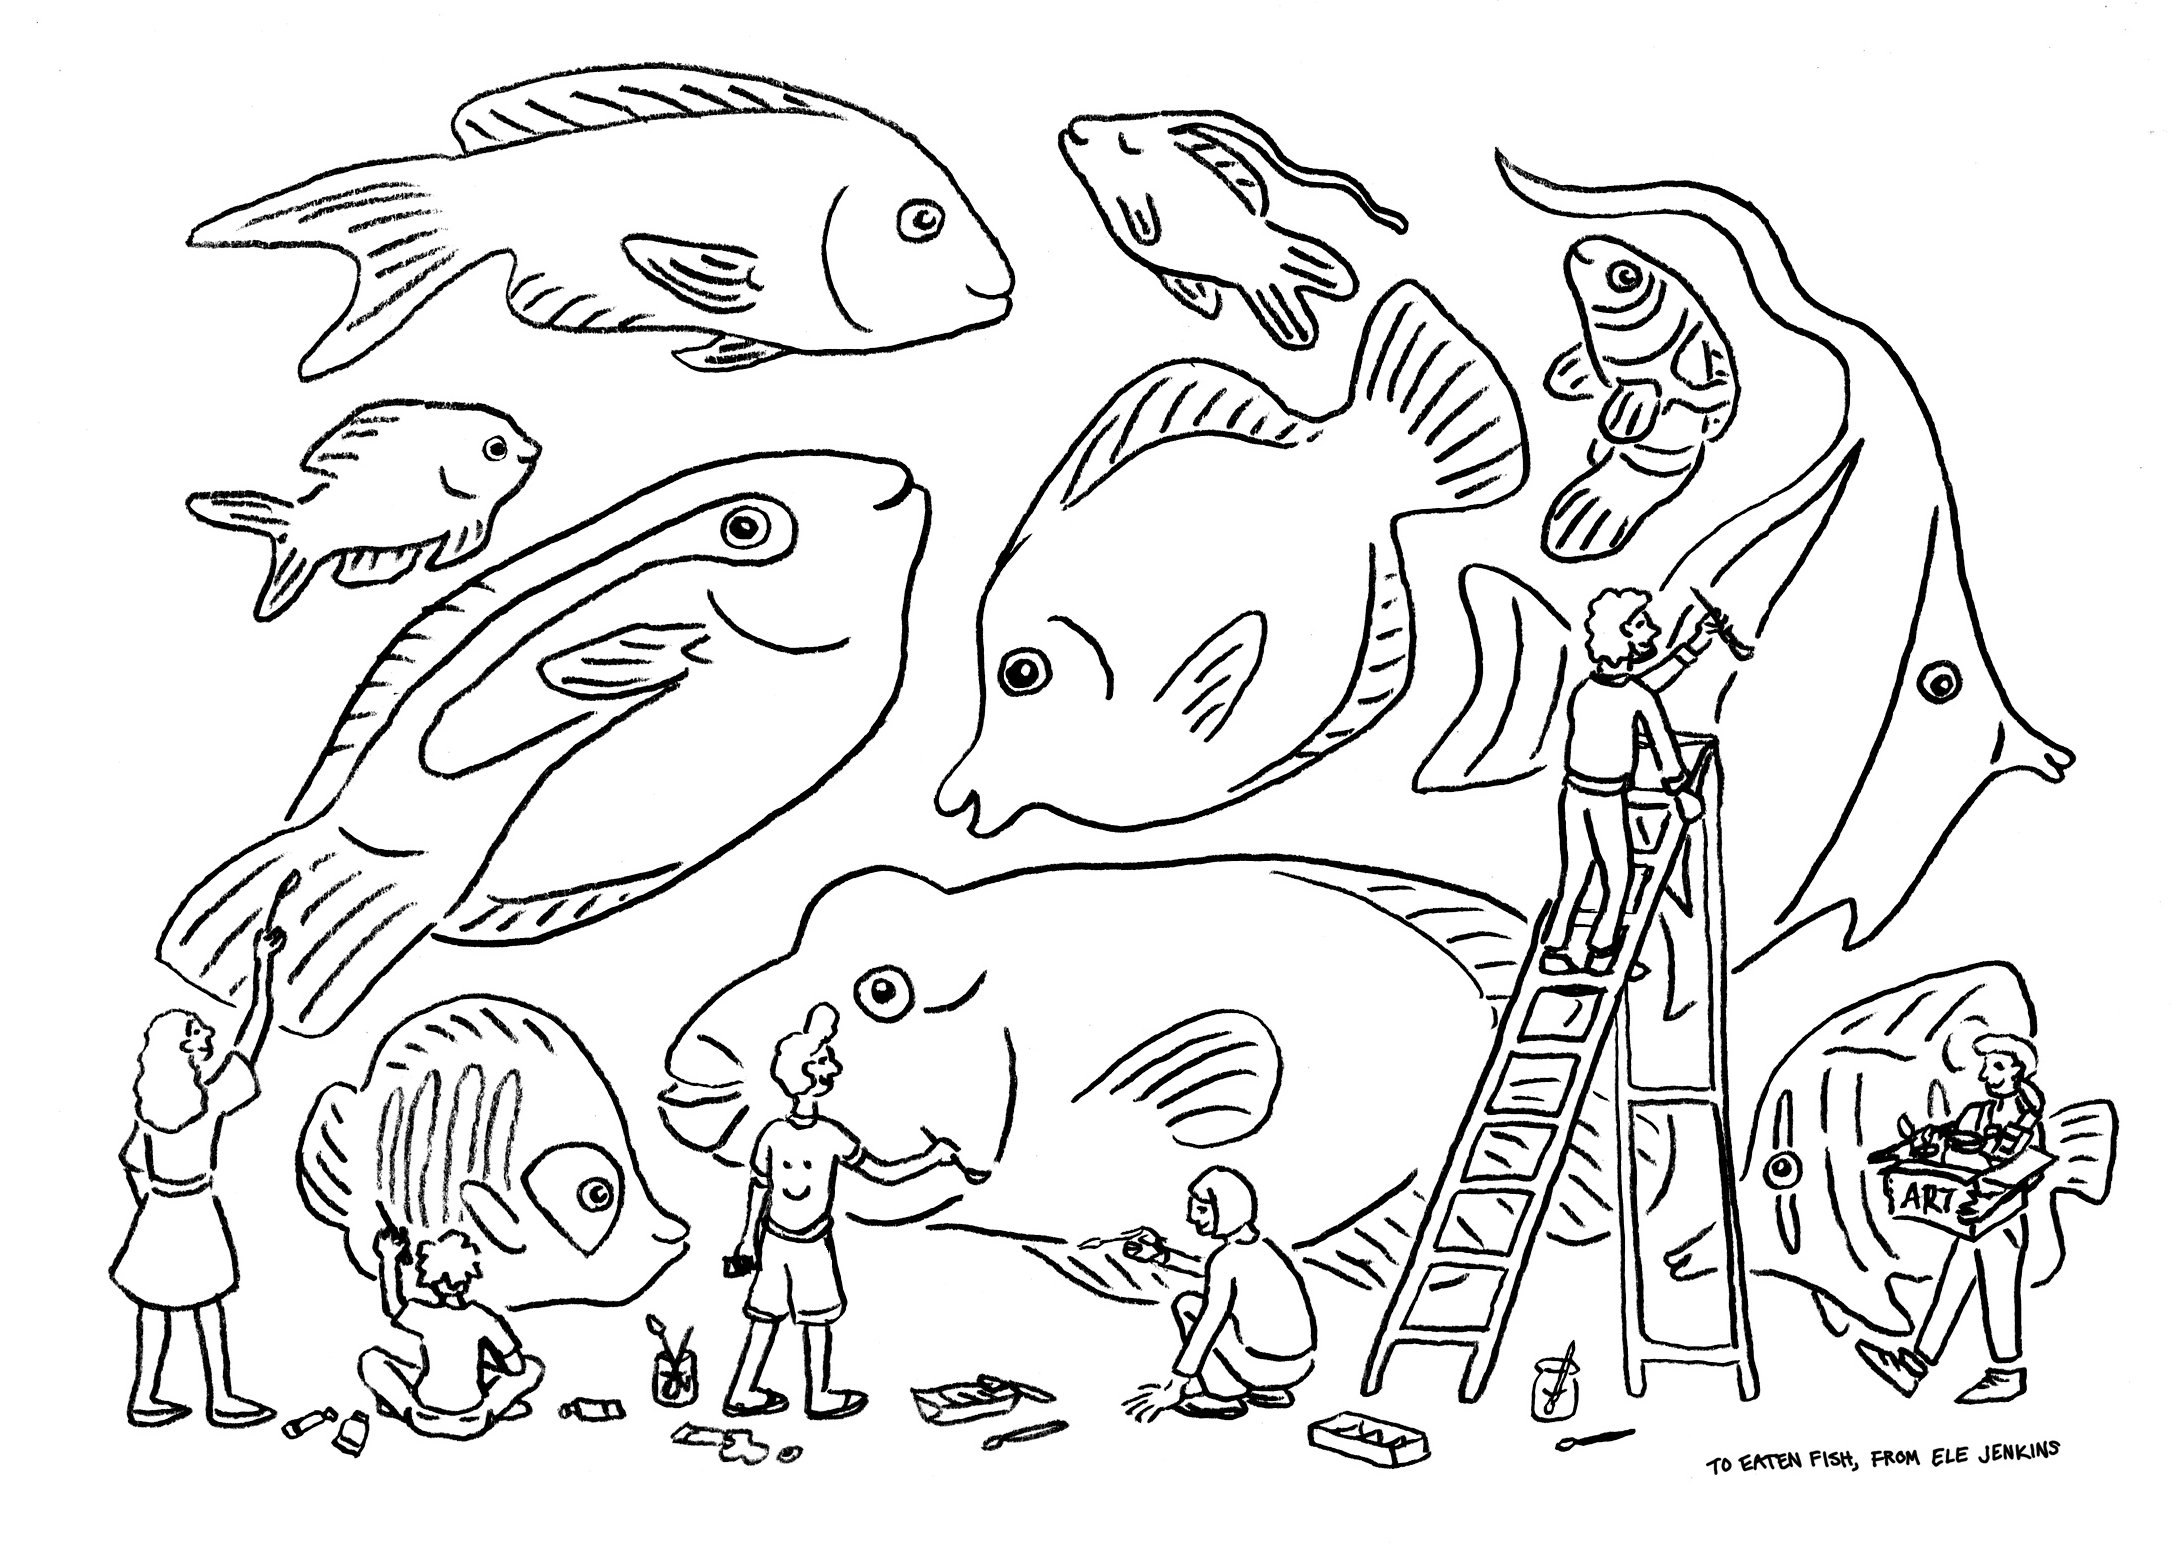 eaten fish a5 size.jpg